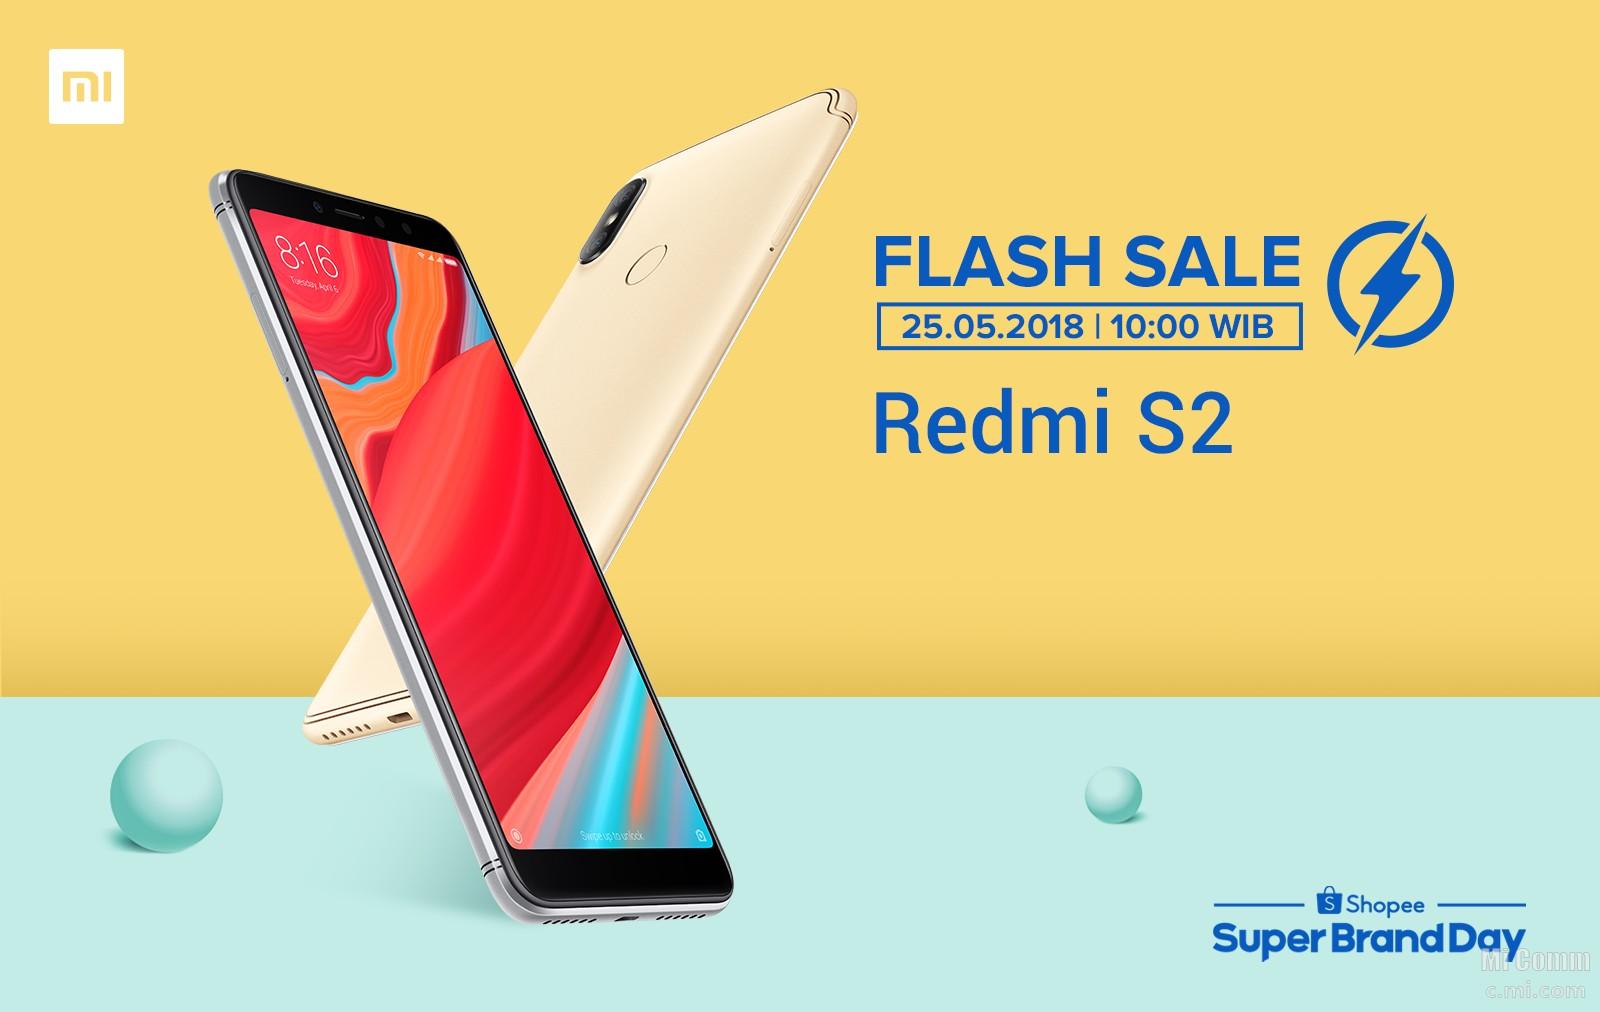 Super Brand Day : Flash Sale Redmi S2 jam 10:00 WIB! Awas